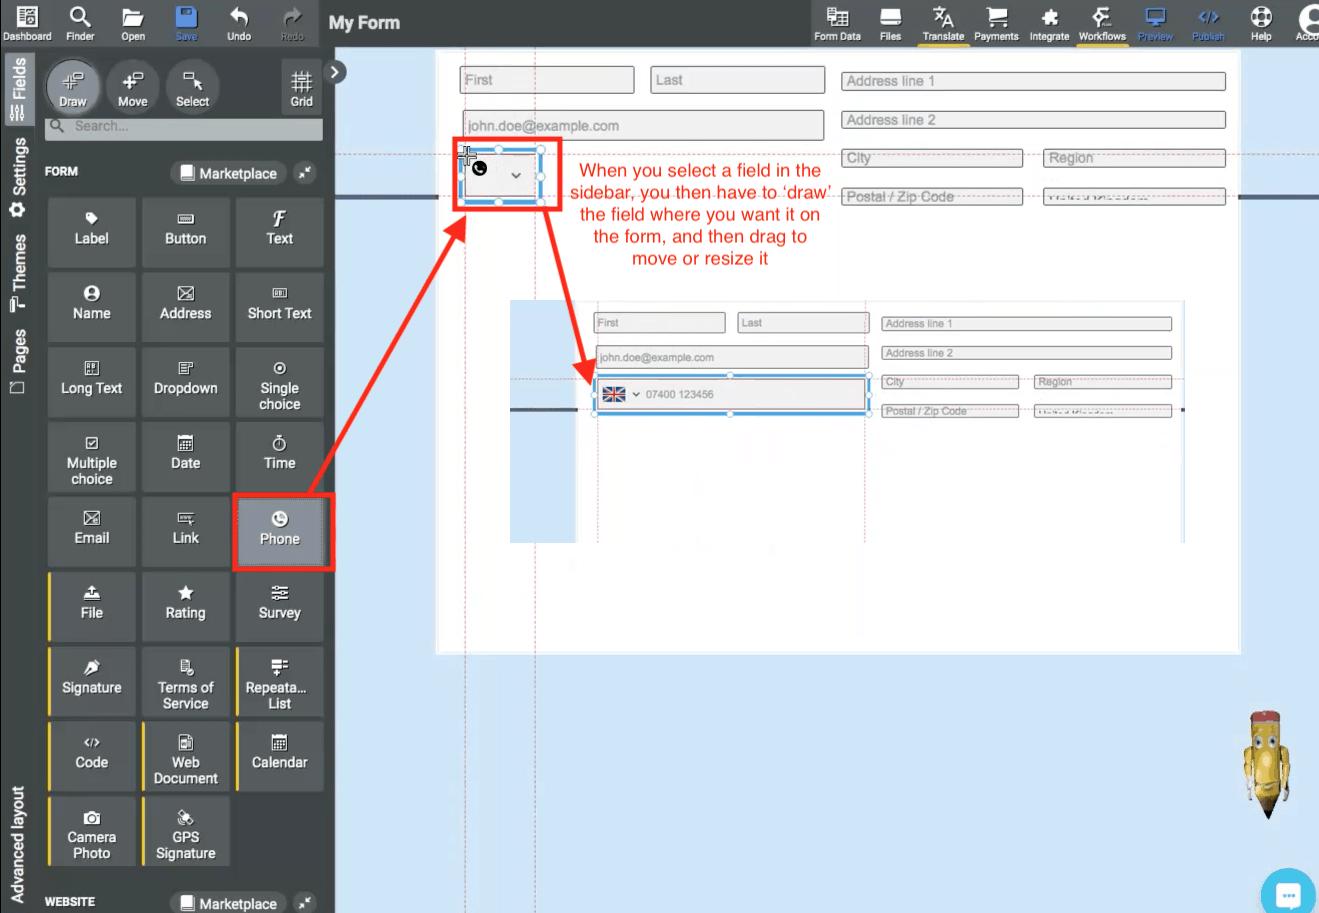 AbcSubmit screenshot - Form builder